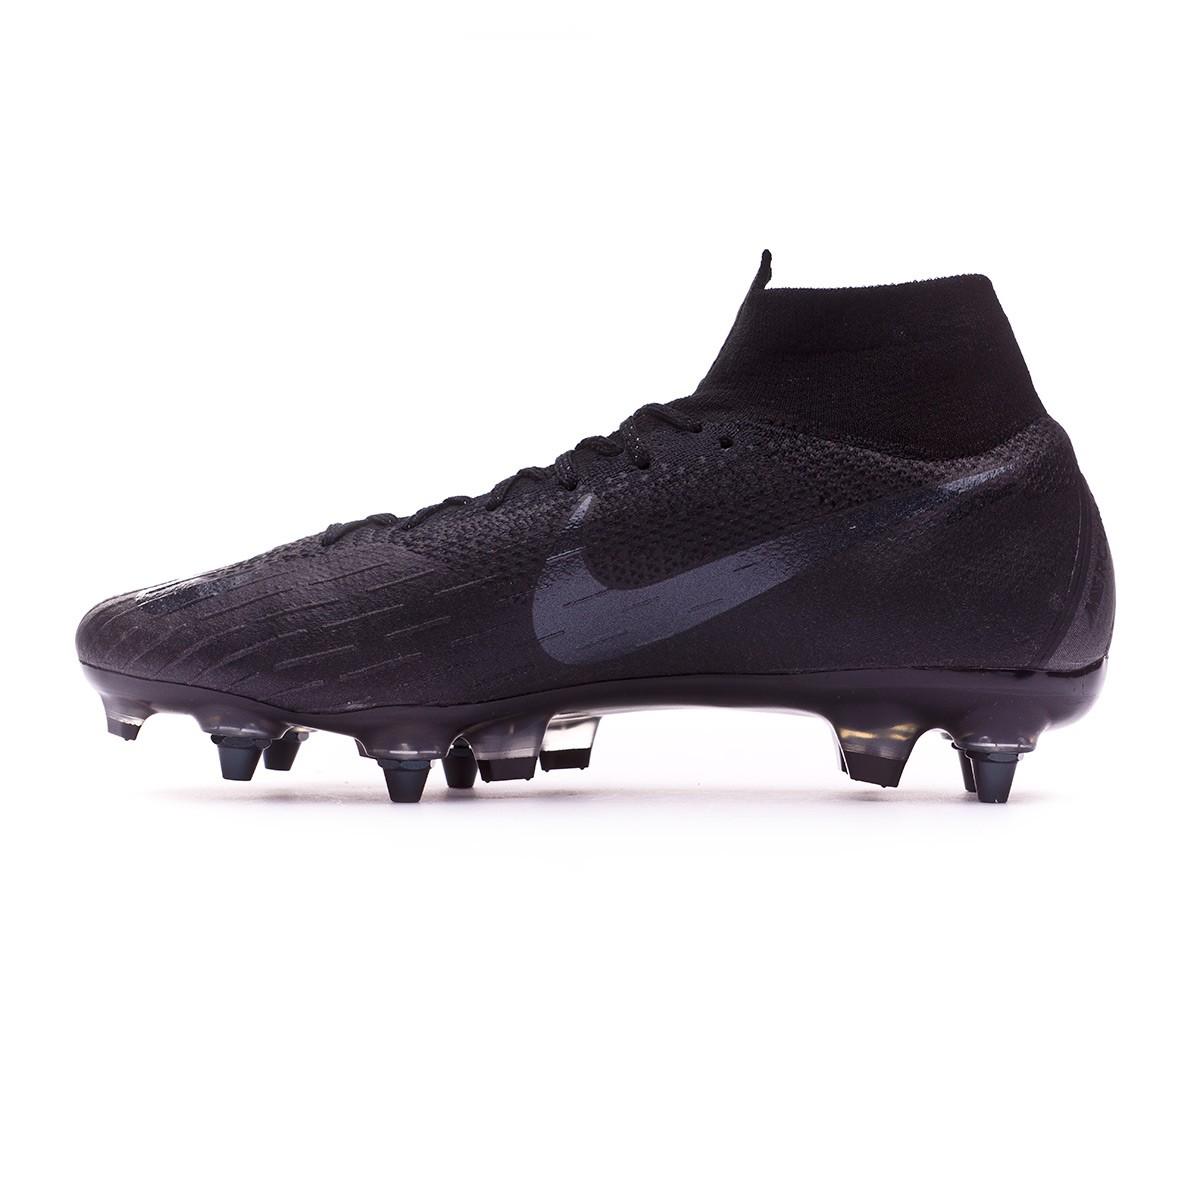 Combatiente halcón Tutor  Football Boots Nike Mercurial Superfly VI Elite Anti-Clog SG-Pro Black -  Football store Fútbol Emotion